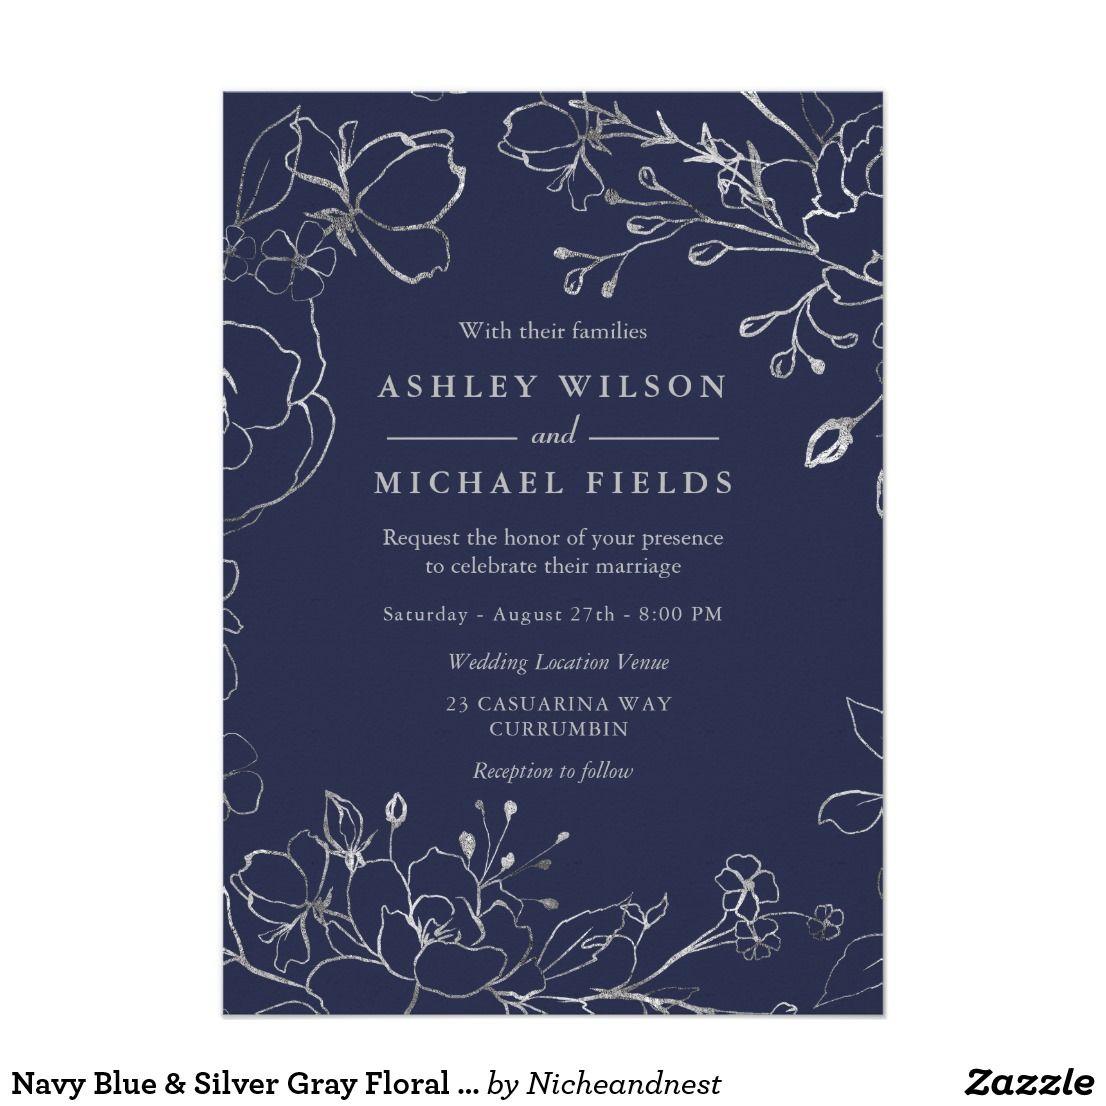 Navy Blue Silver Gray Floral Modern Wedding Invitation Zazzle Com Navy Wedding Invitations Navy Blue Wedding Invitations Blue Wedding Invitations